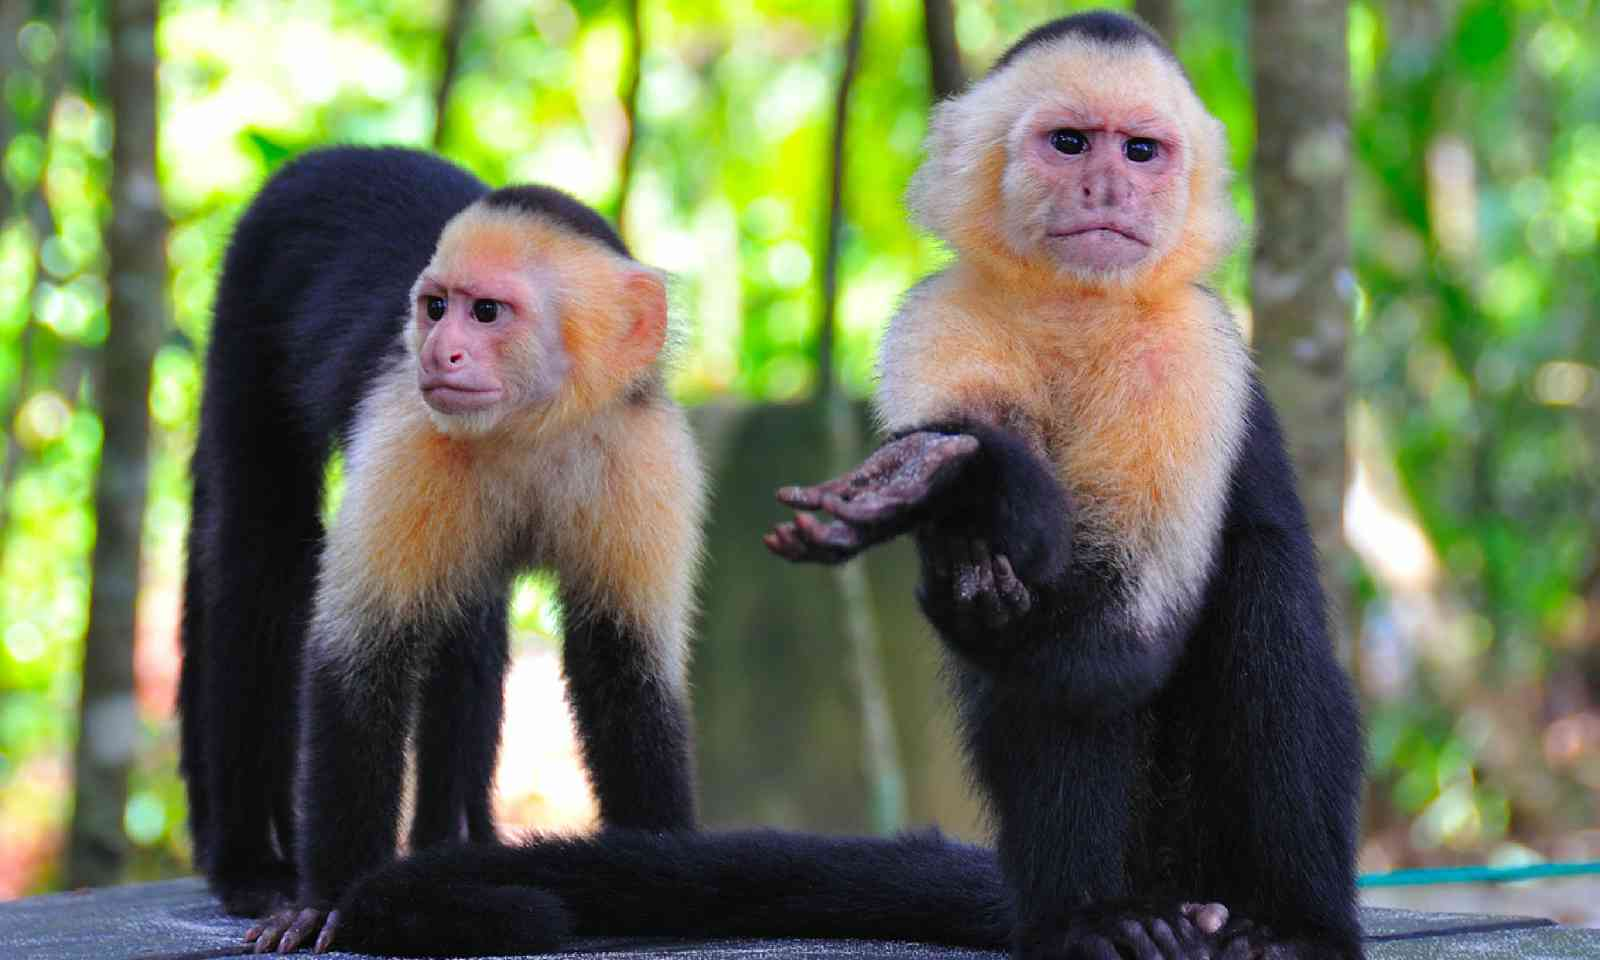 Spider monkeys in Costa Rica (Dreamstime)